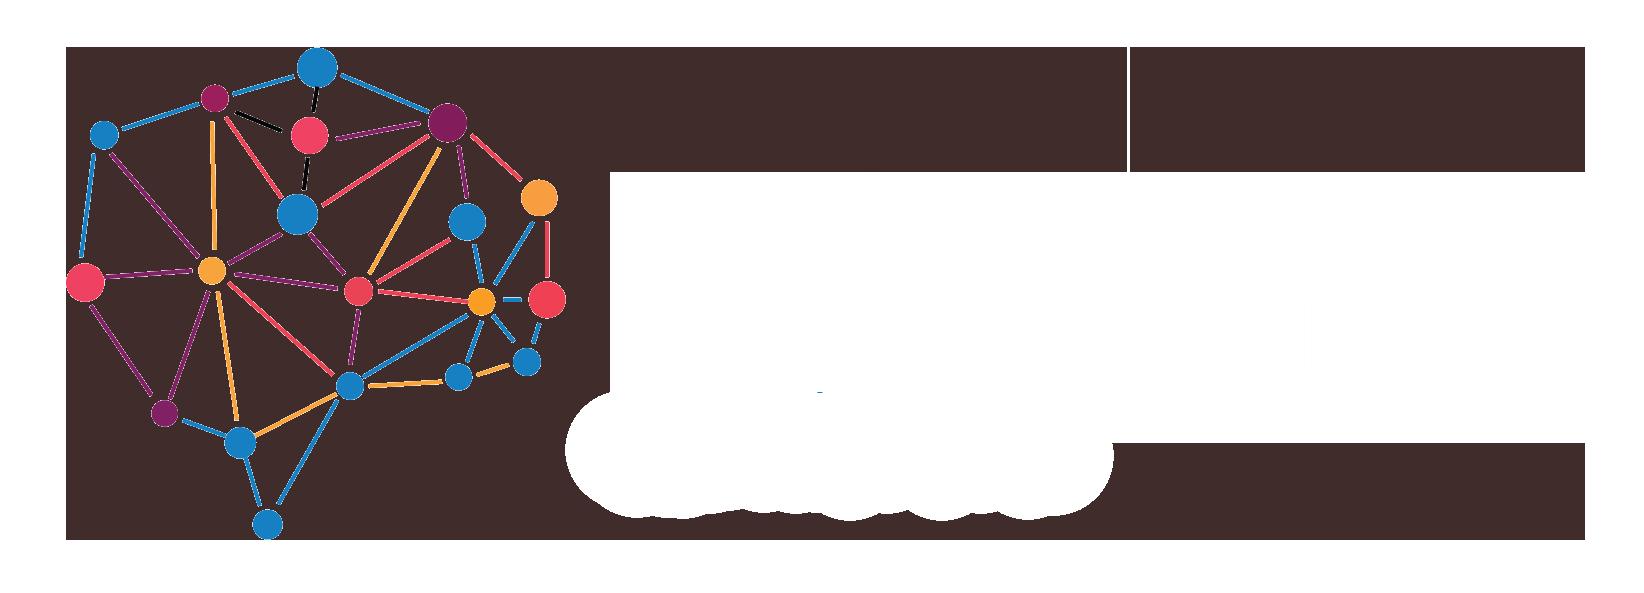 José Medina Bambach